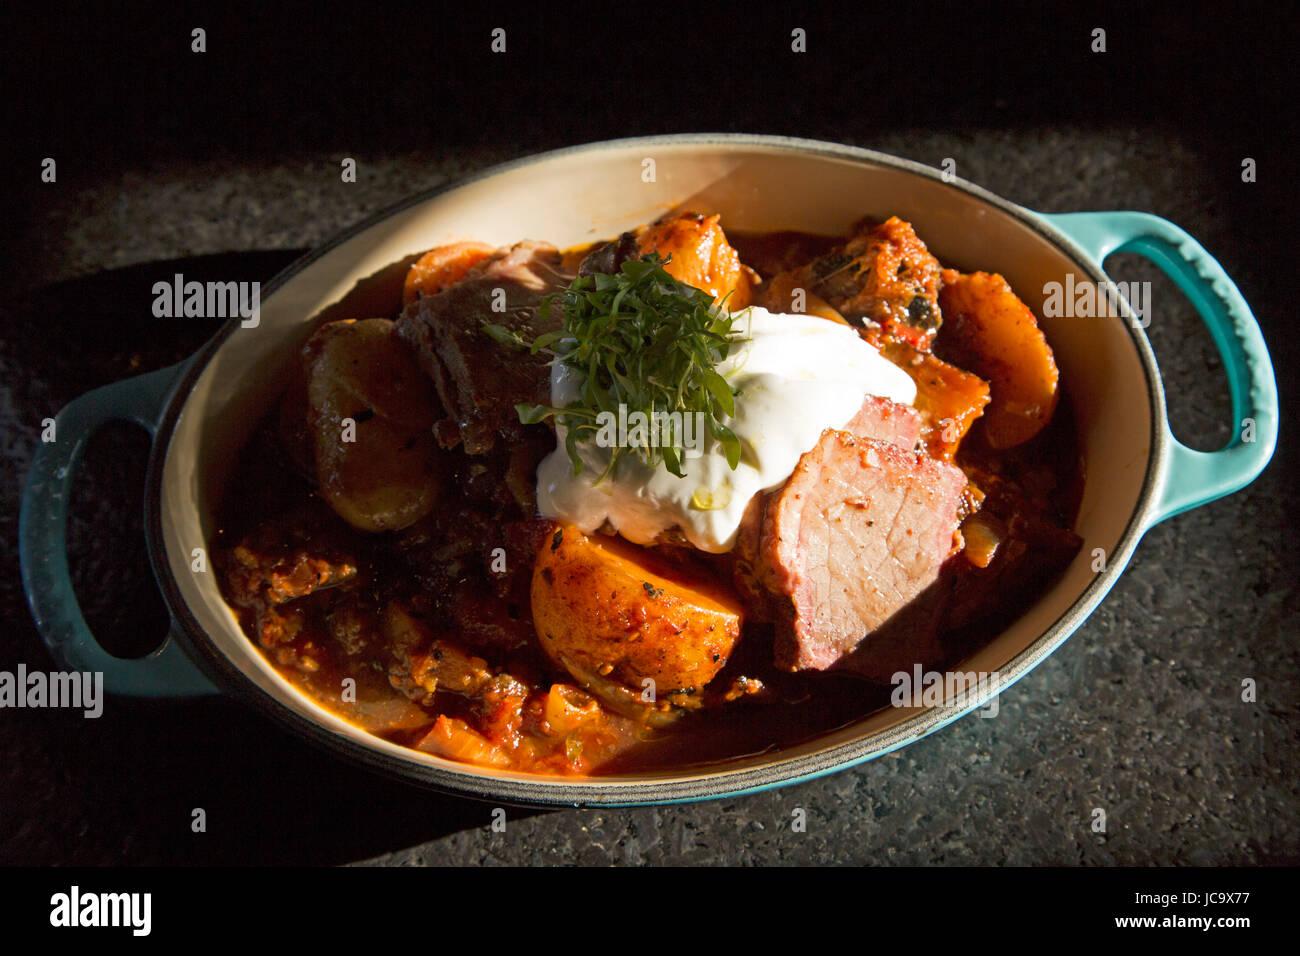 Argentinian Beef Stockfotos & Argentinian Beef Bilder - Alamy